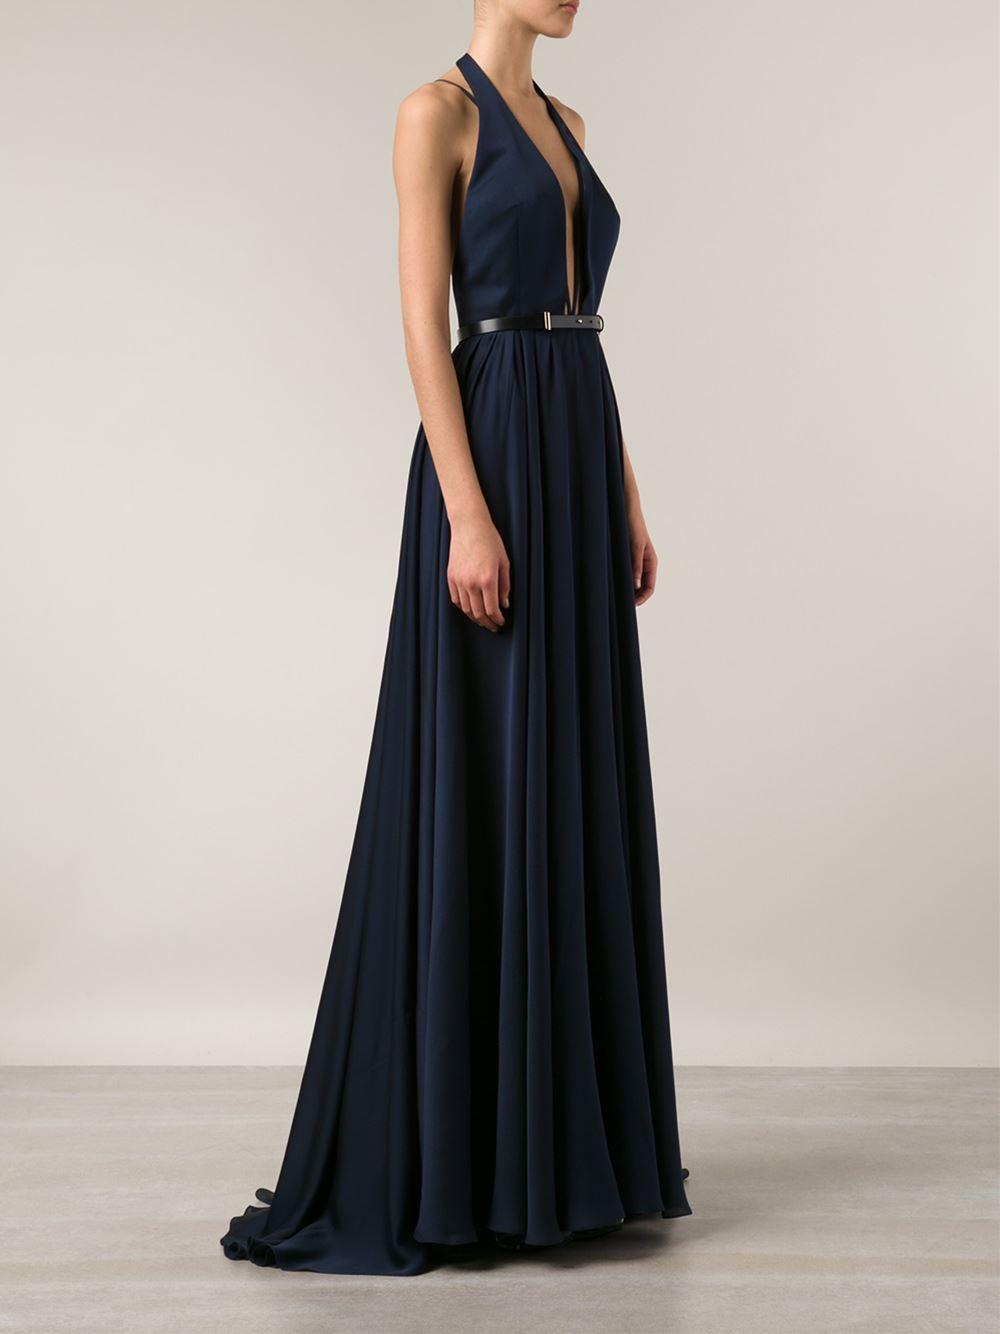 Lyst - Jason Wu Plunging V-Neck Silk Evening Dress in Blue